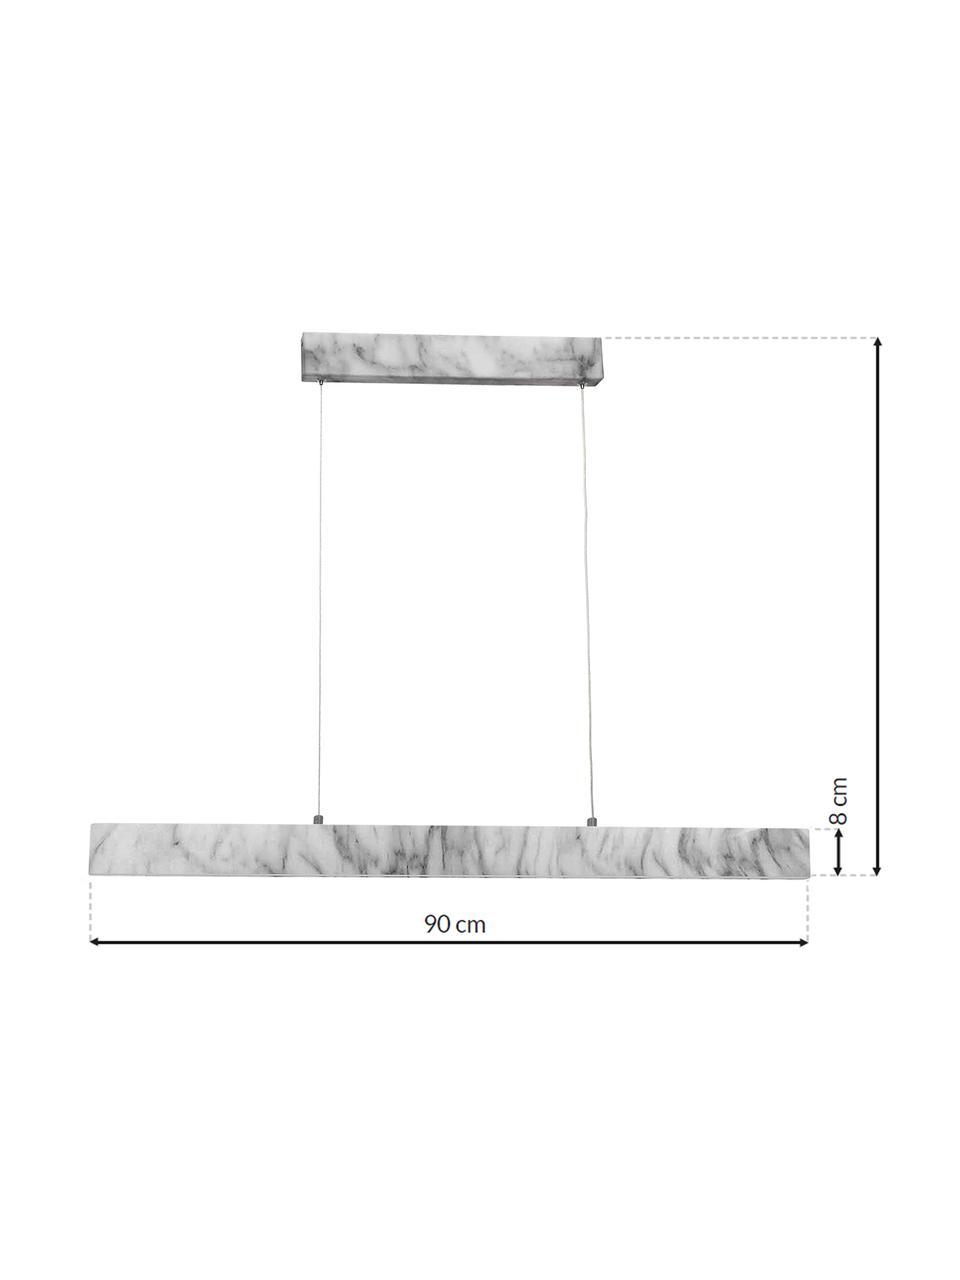 Große Schmale LED-Pendelleuchte Pierce in Marmoroptik, Lampenschirm: Metall, foliert, Baldachin: Metall, foliert, Weiß, marmoriert, 90 x 10 cm